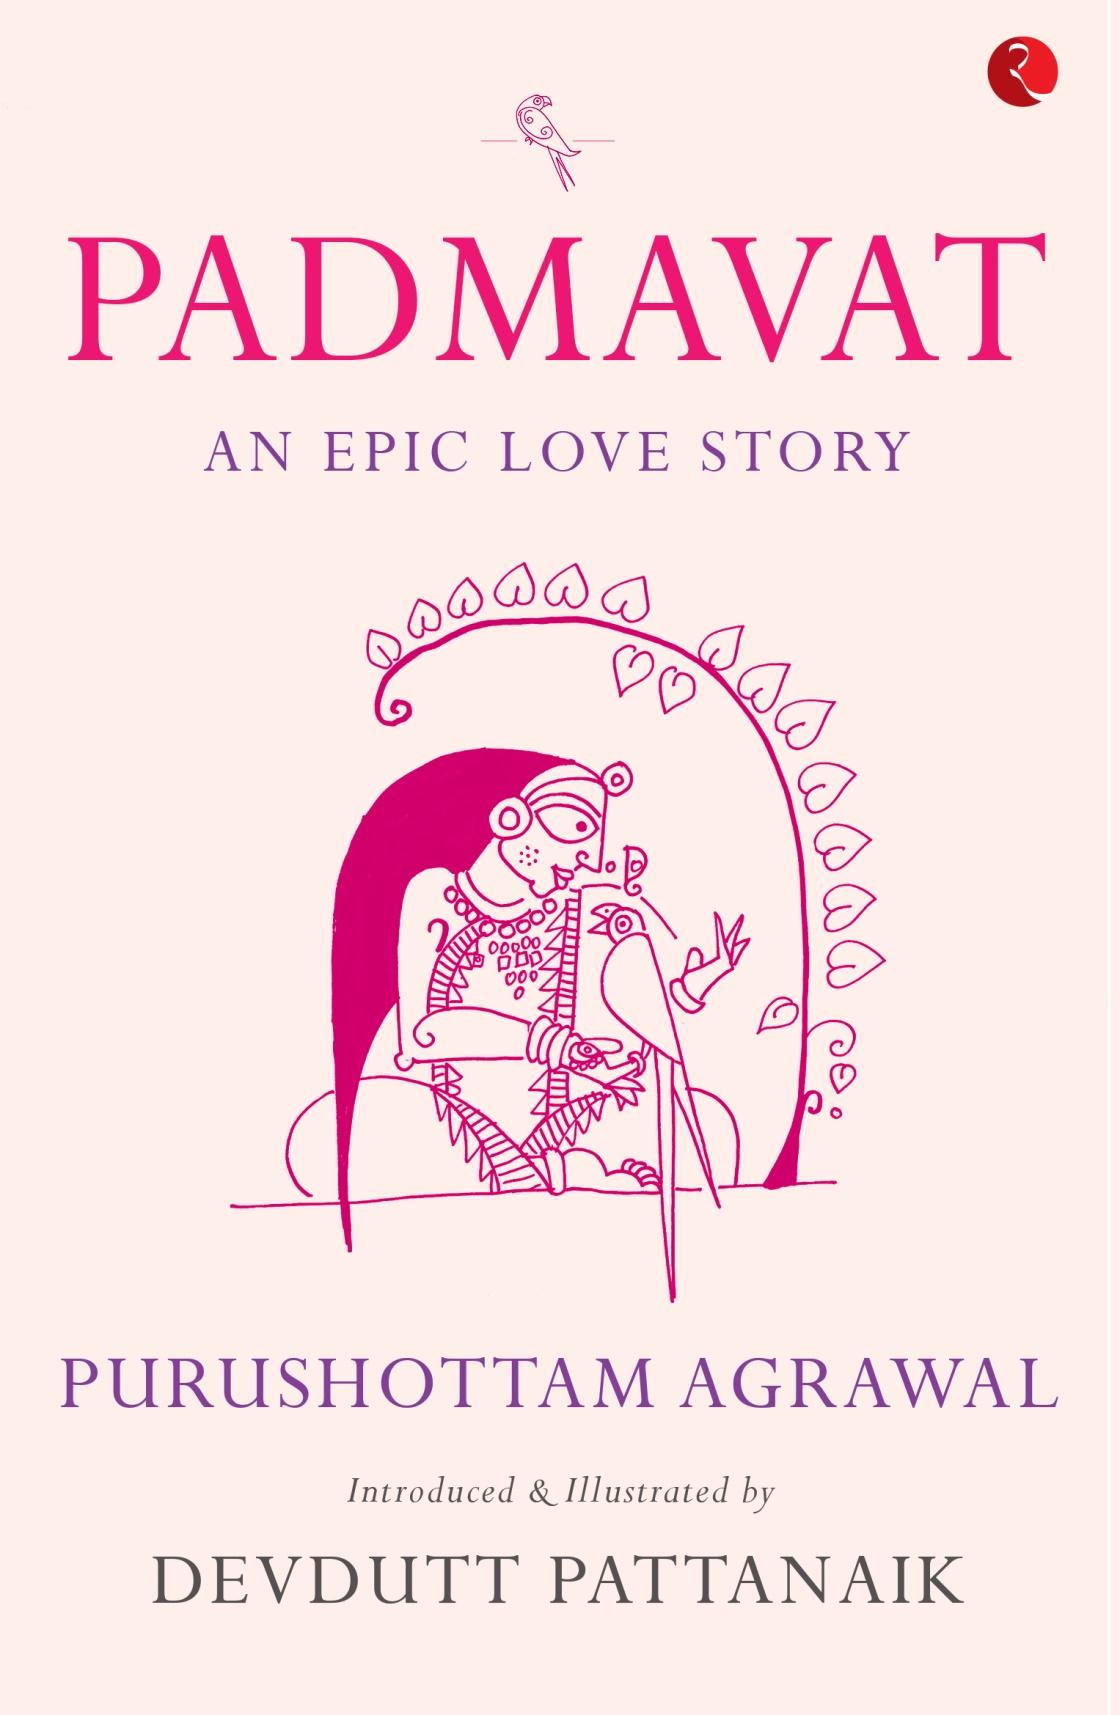 Padmavat - Purushottam Agrawal Image